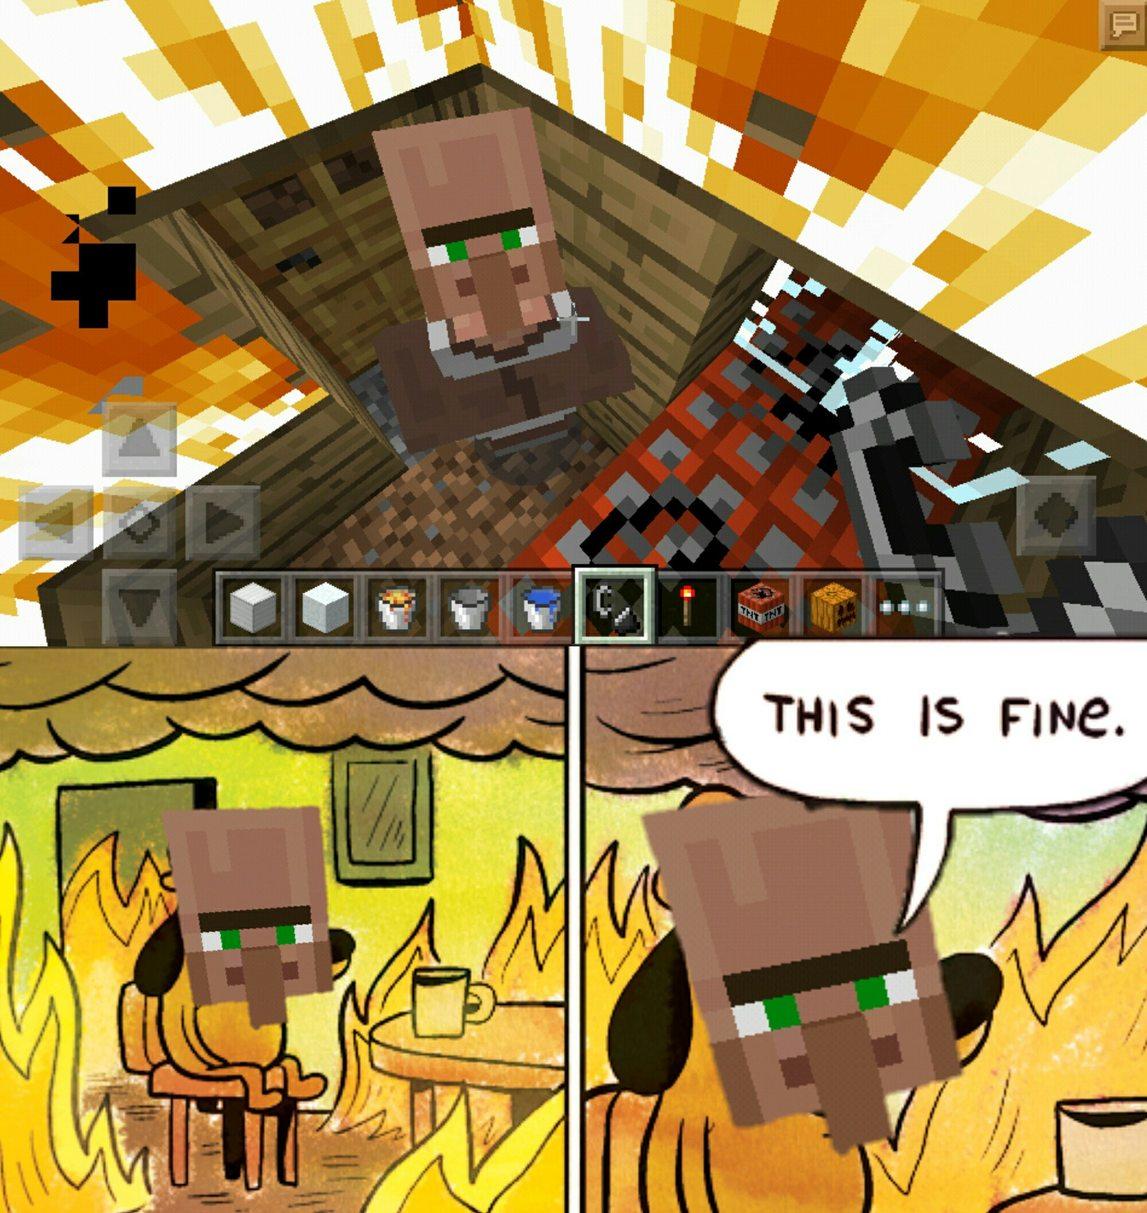 Al final lo salve :really: - meme